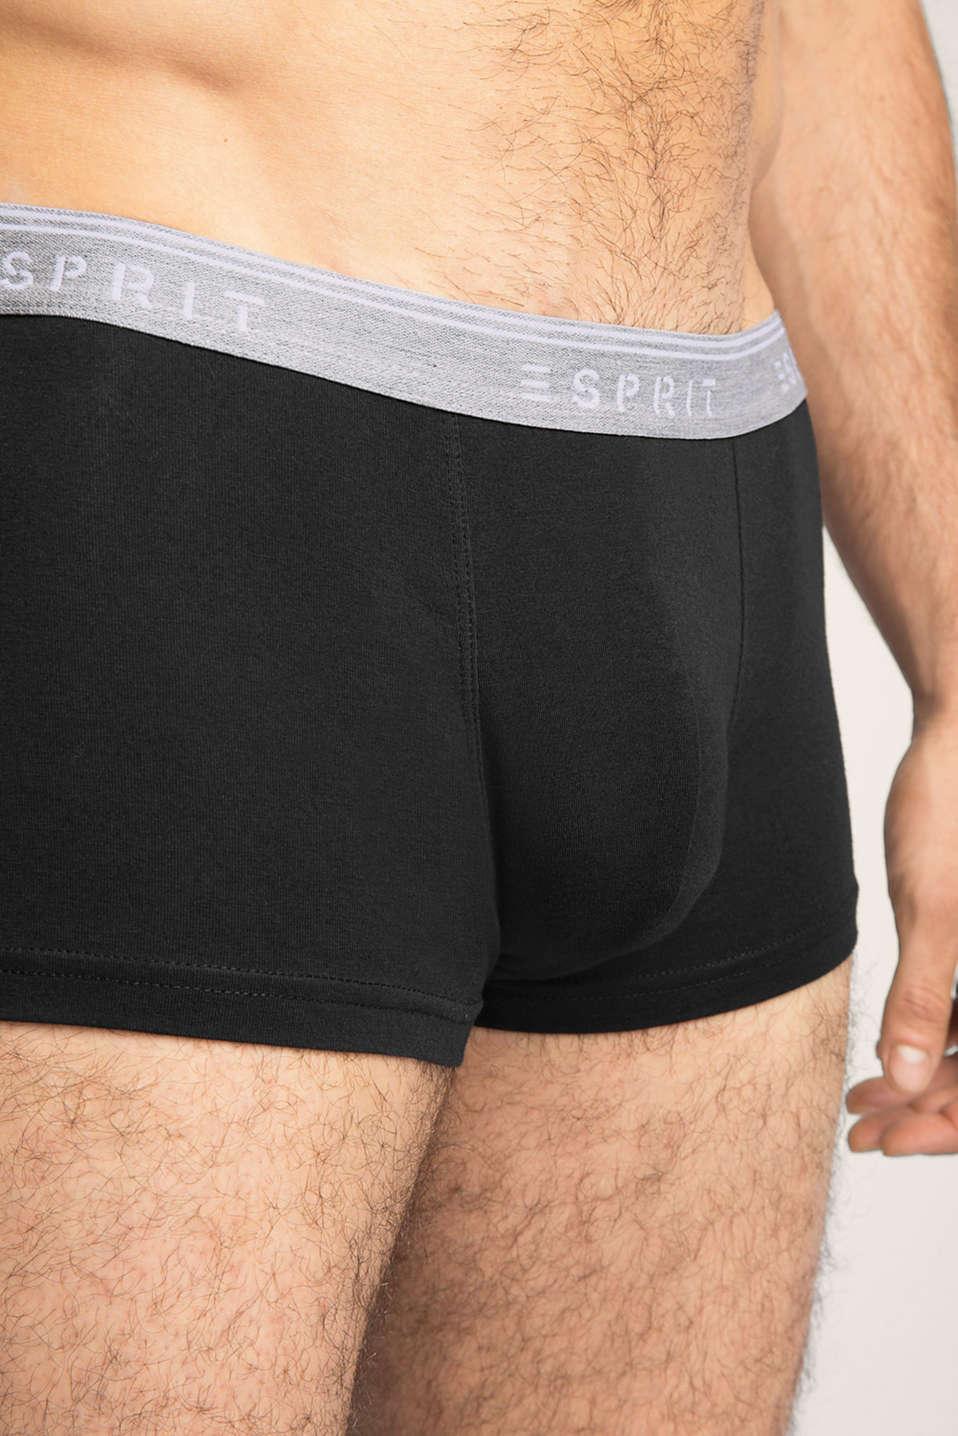 Stretch cotton hipster shorts, BLACK, detail image number 2